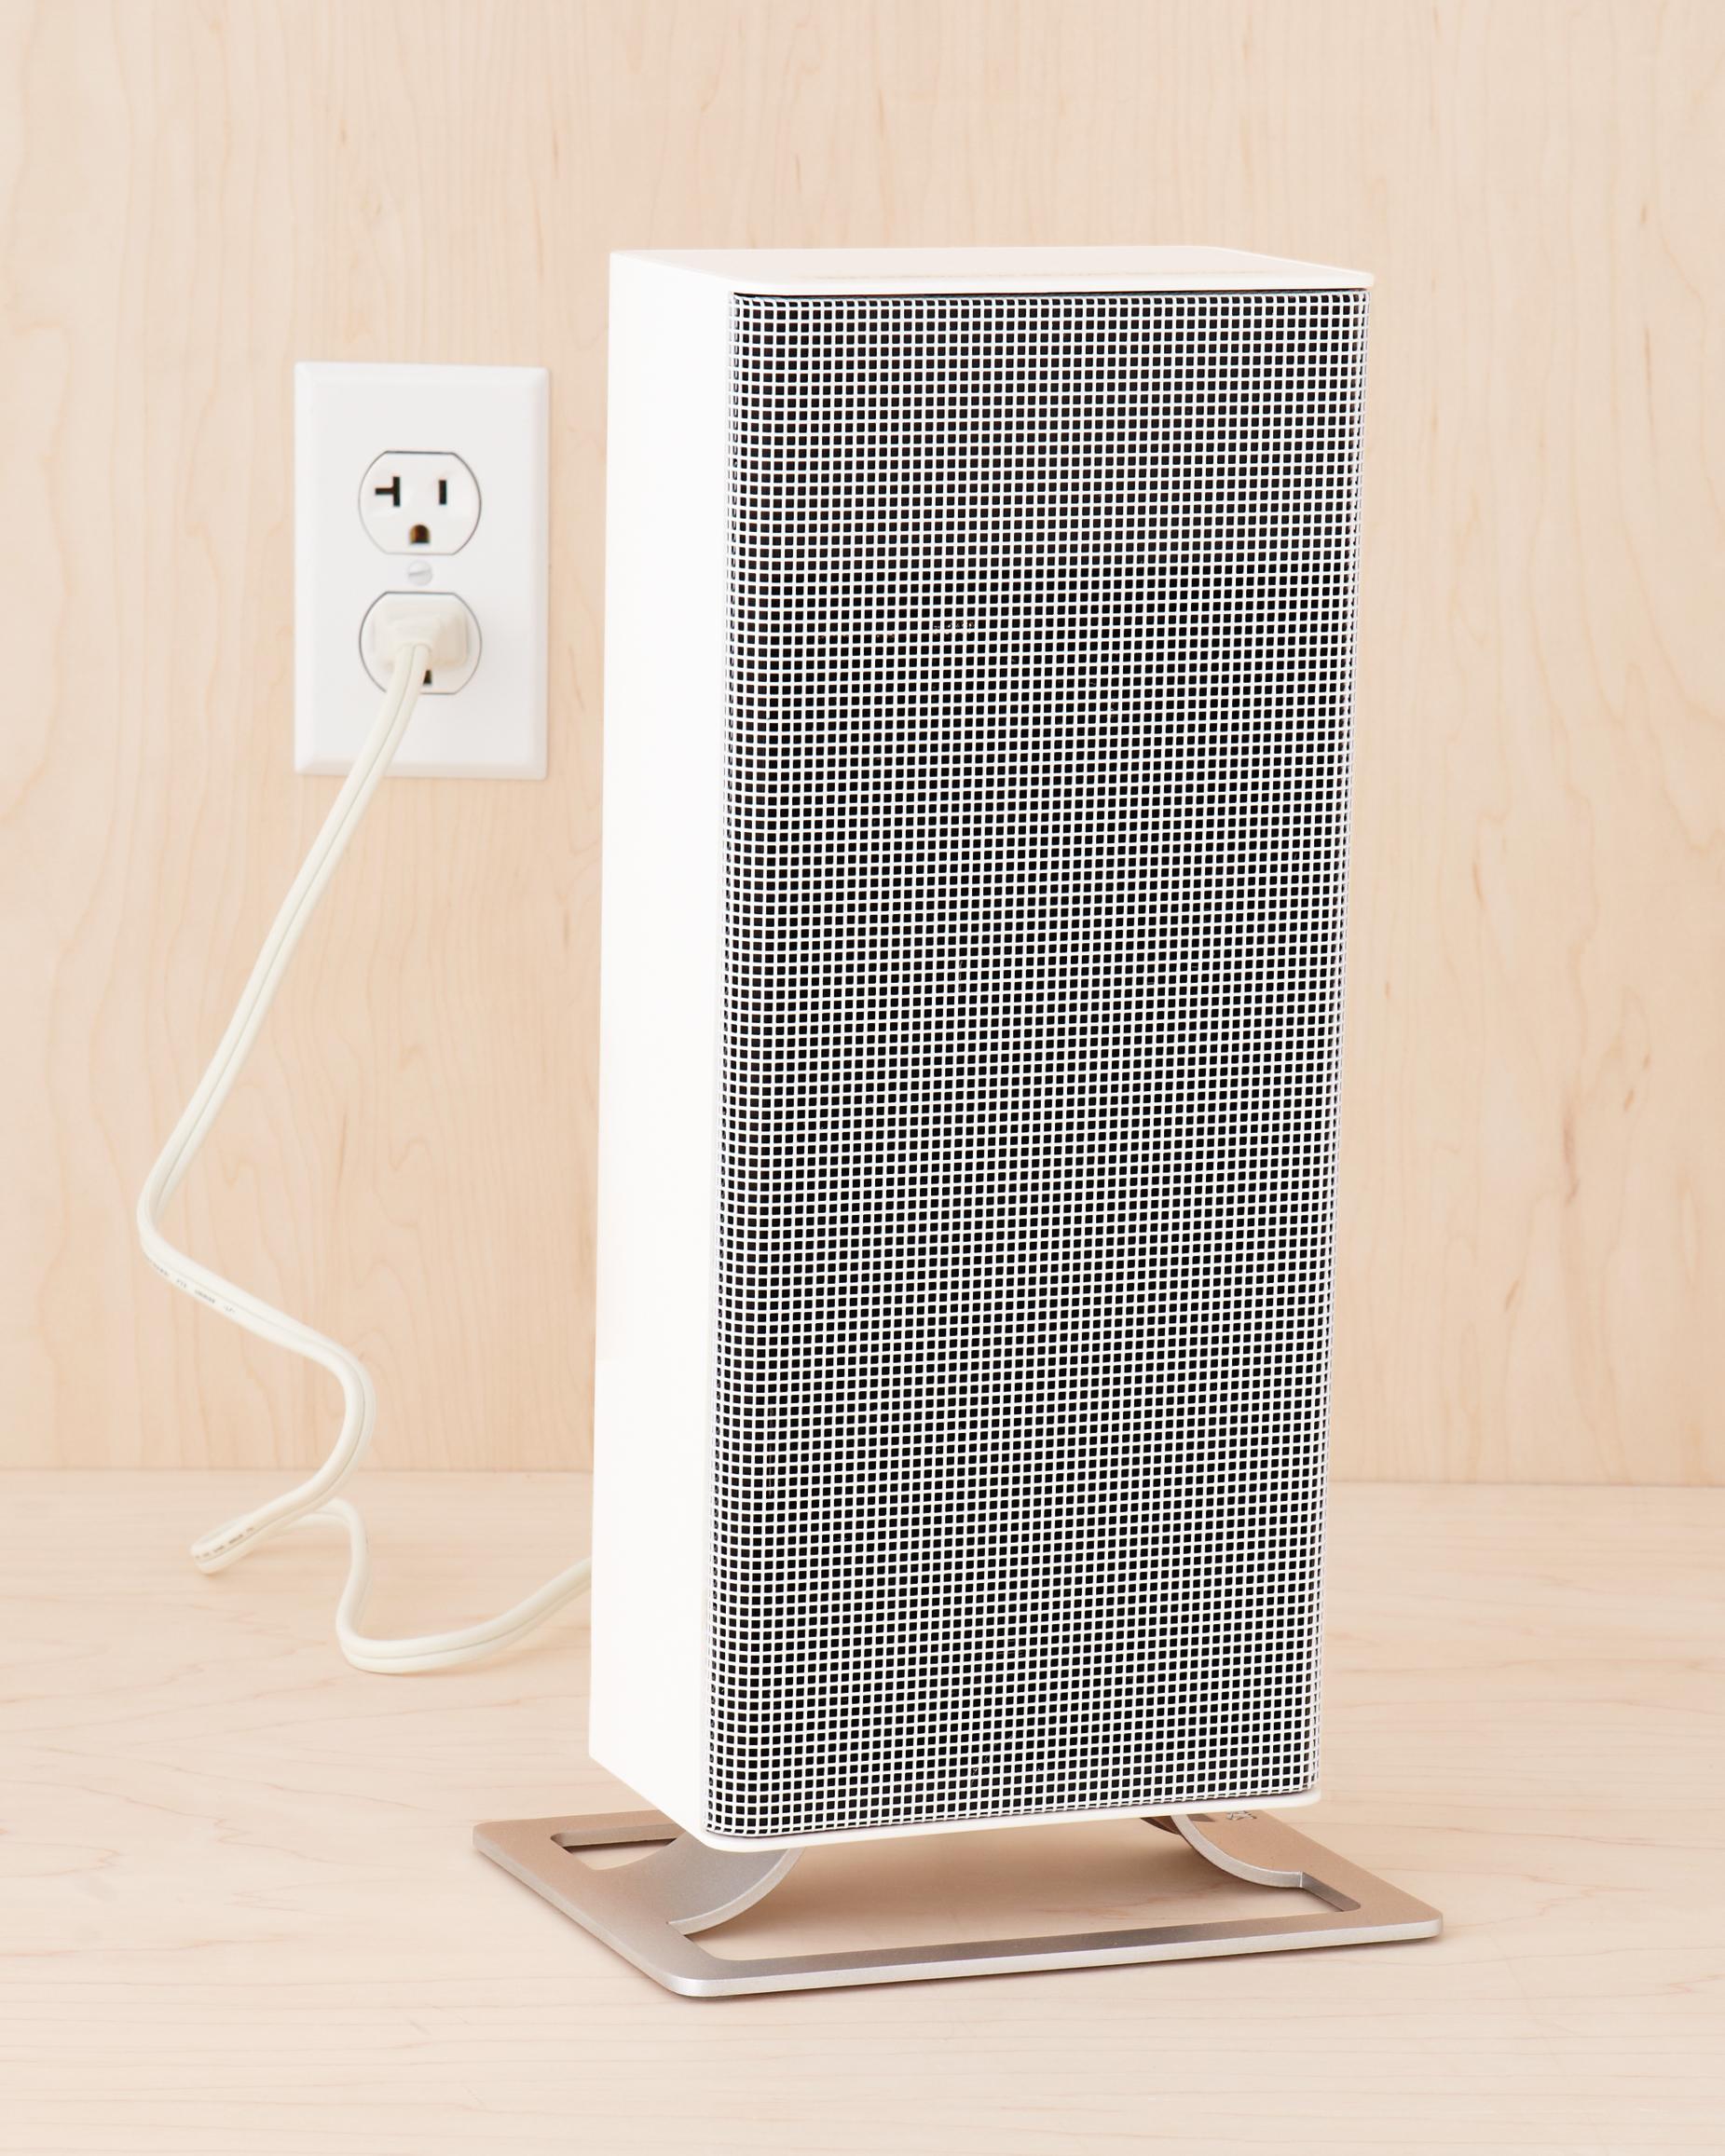 space-heater-016-mwd109796.jpg